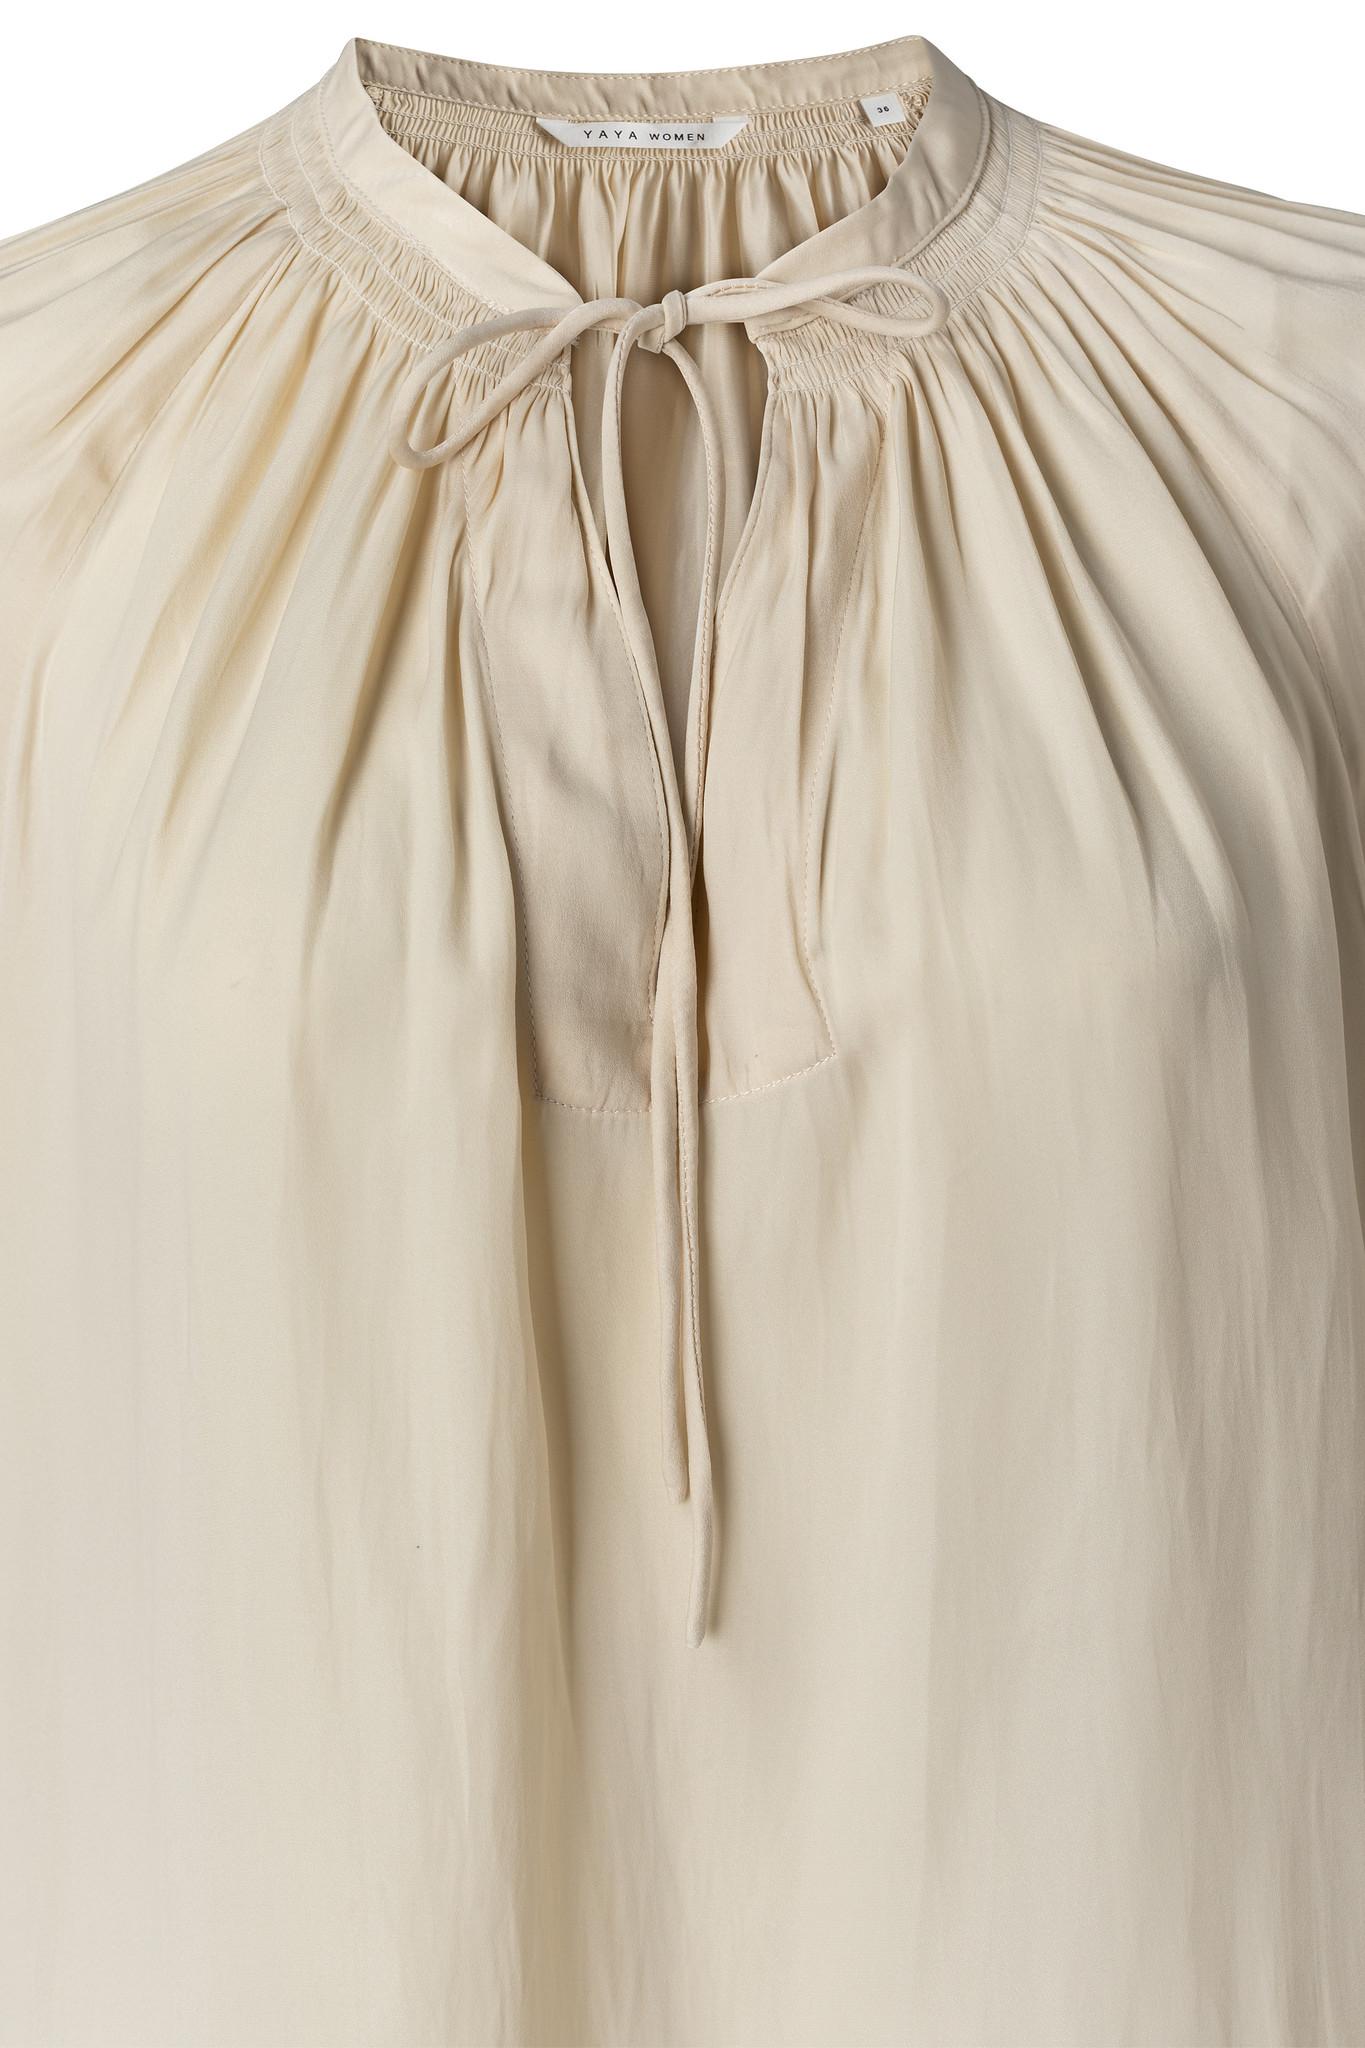 yaya Drapy tunic top 1901412-113-2